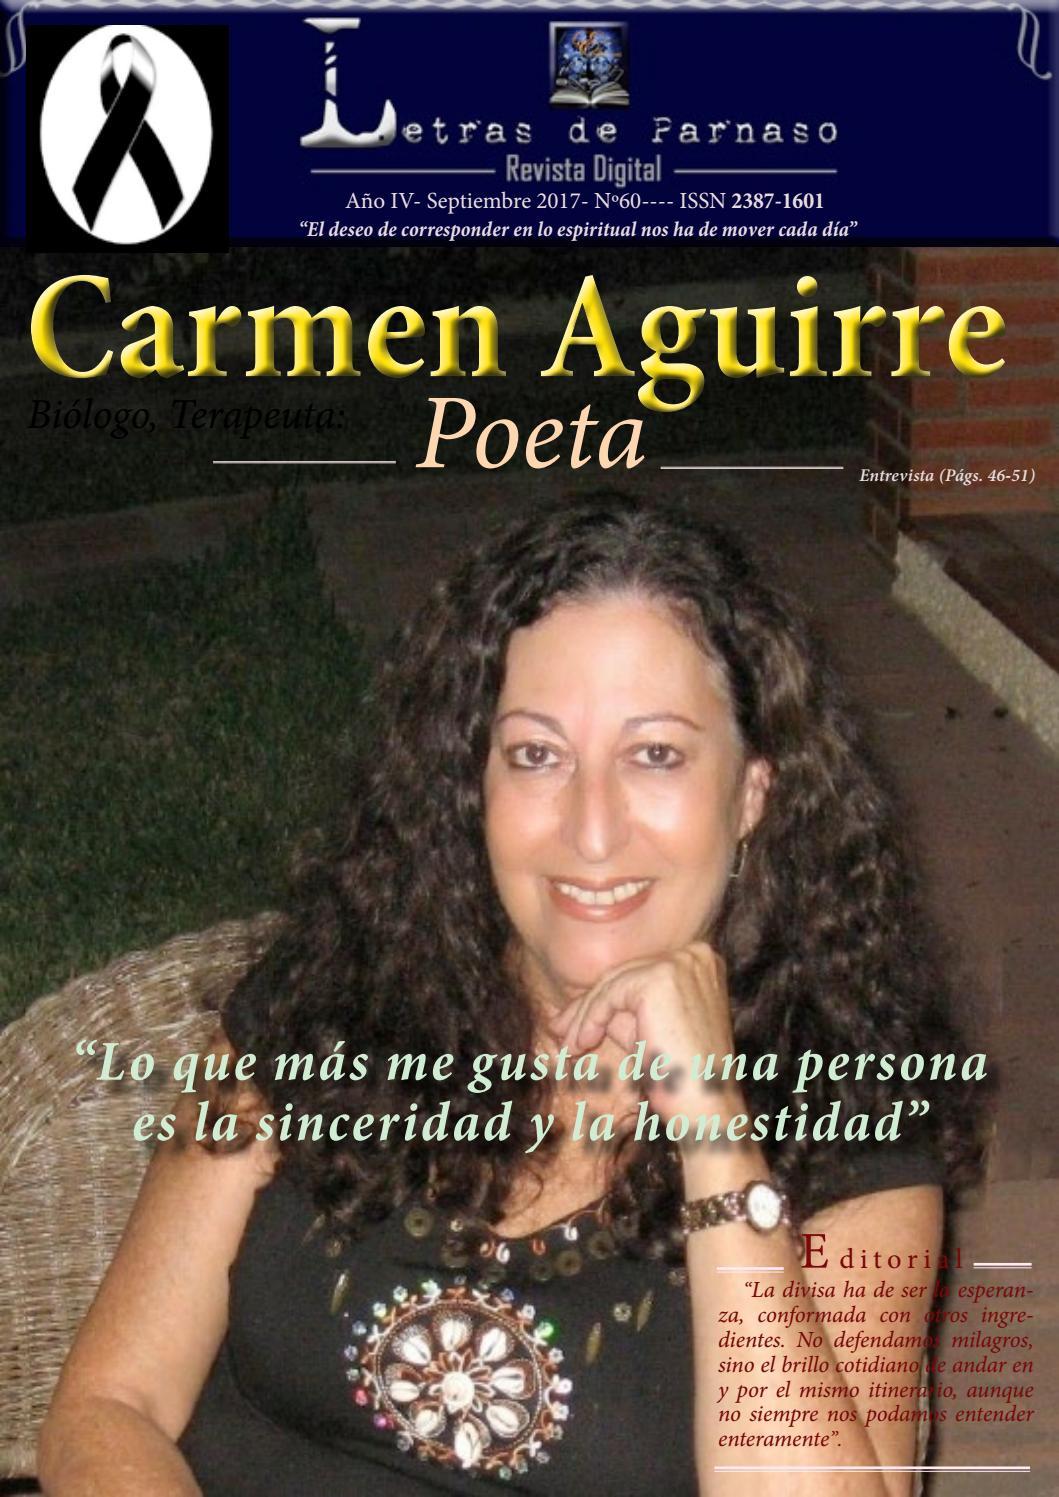 Edicion60 by Juan Antonio Pellicer - issuu 30a5b38600e3